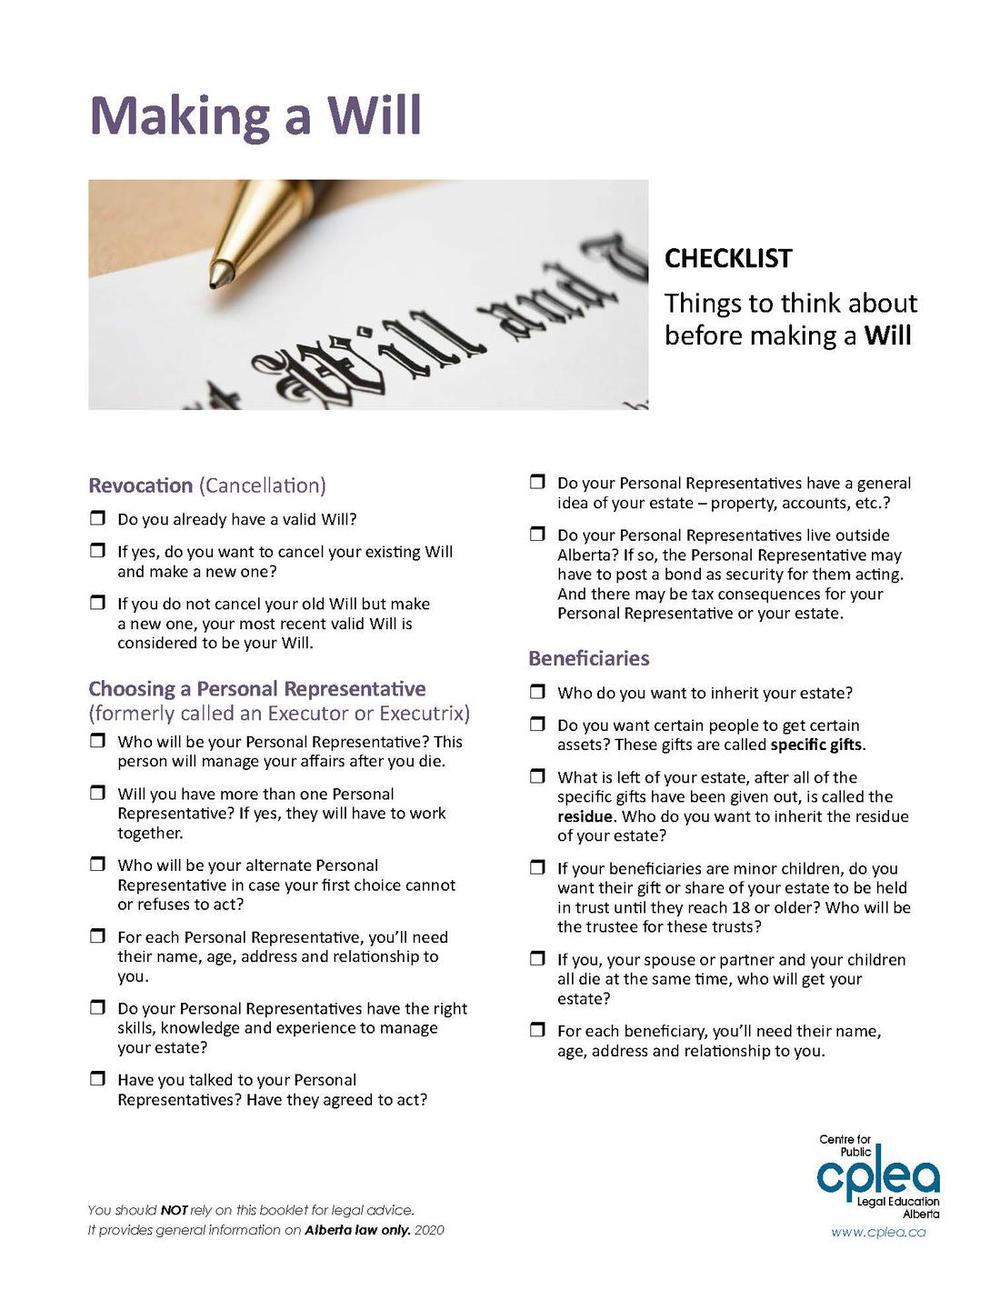 Making a Will - CHECKLIST